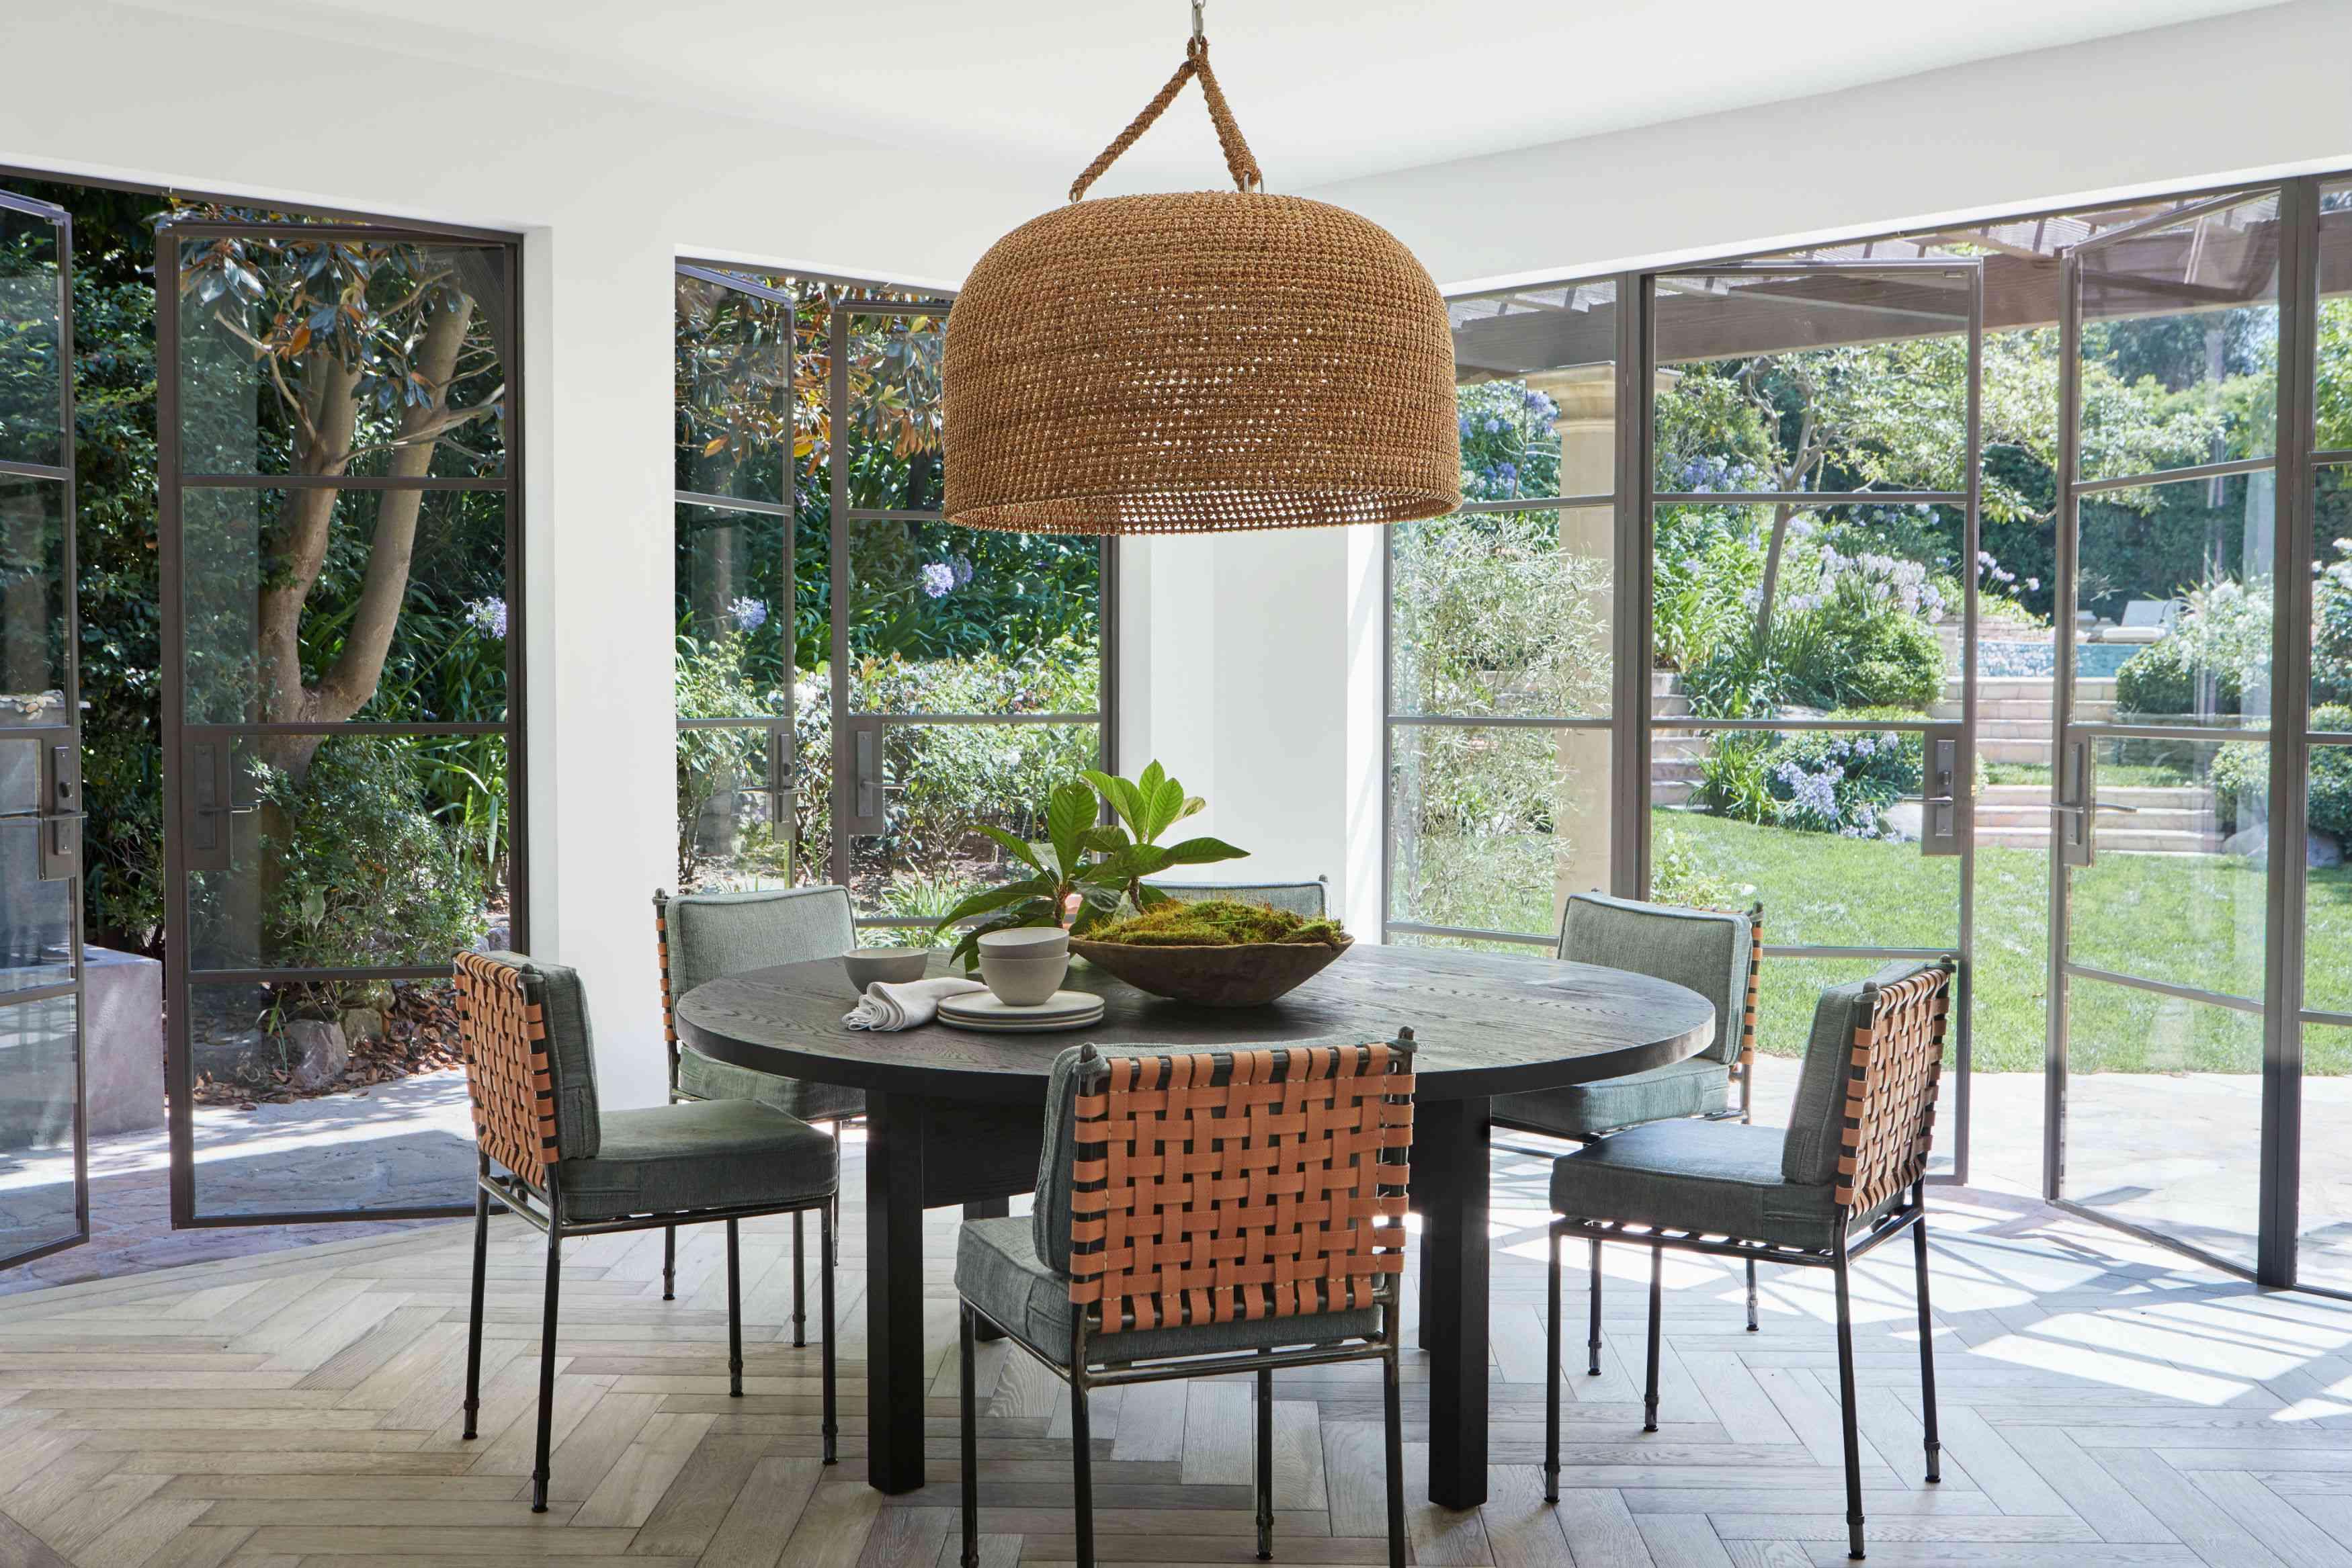 Kitchen Table Beneath a Woven Pendant Light